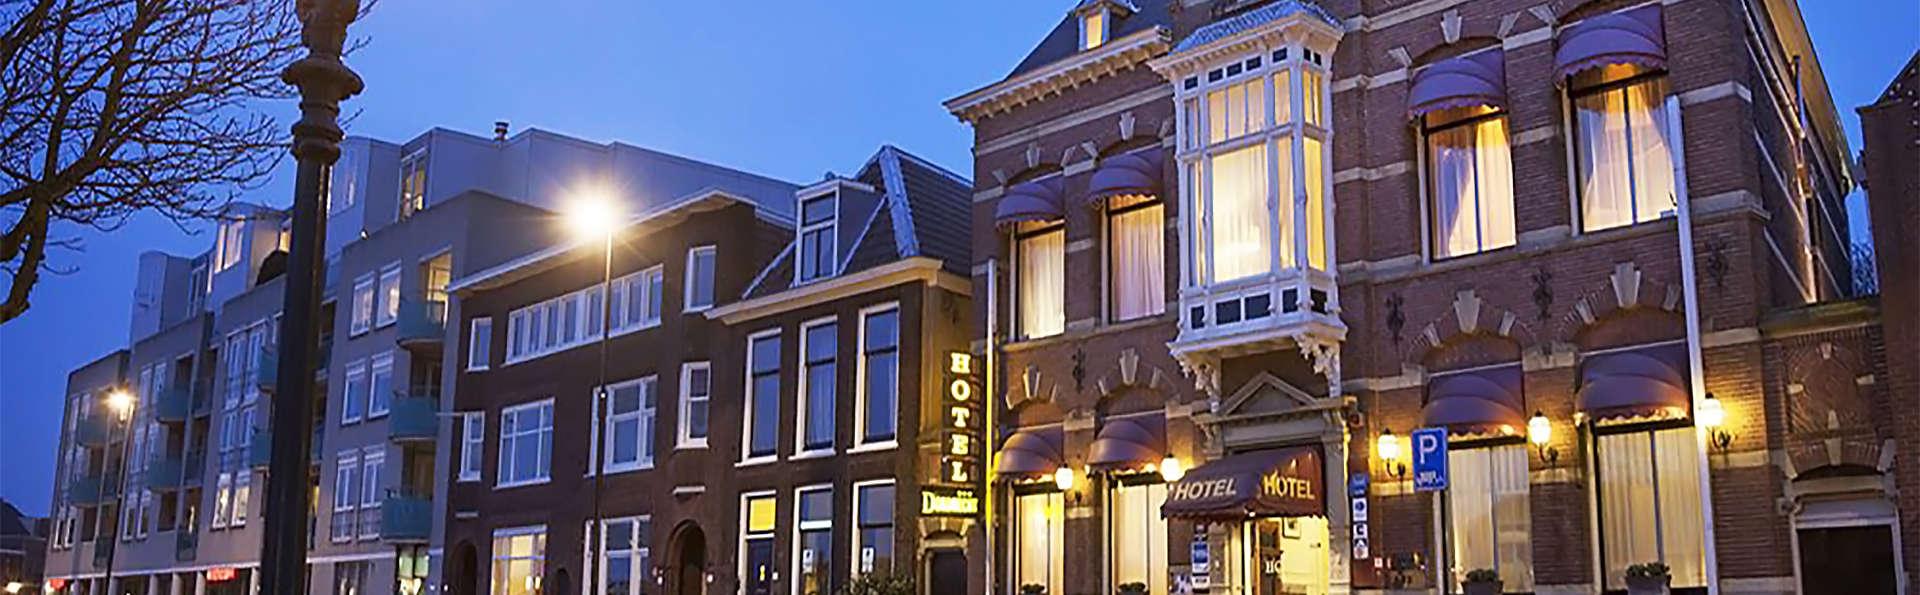 Hotel Dordrecht - EDIT_front3.jpg